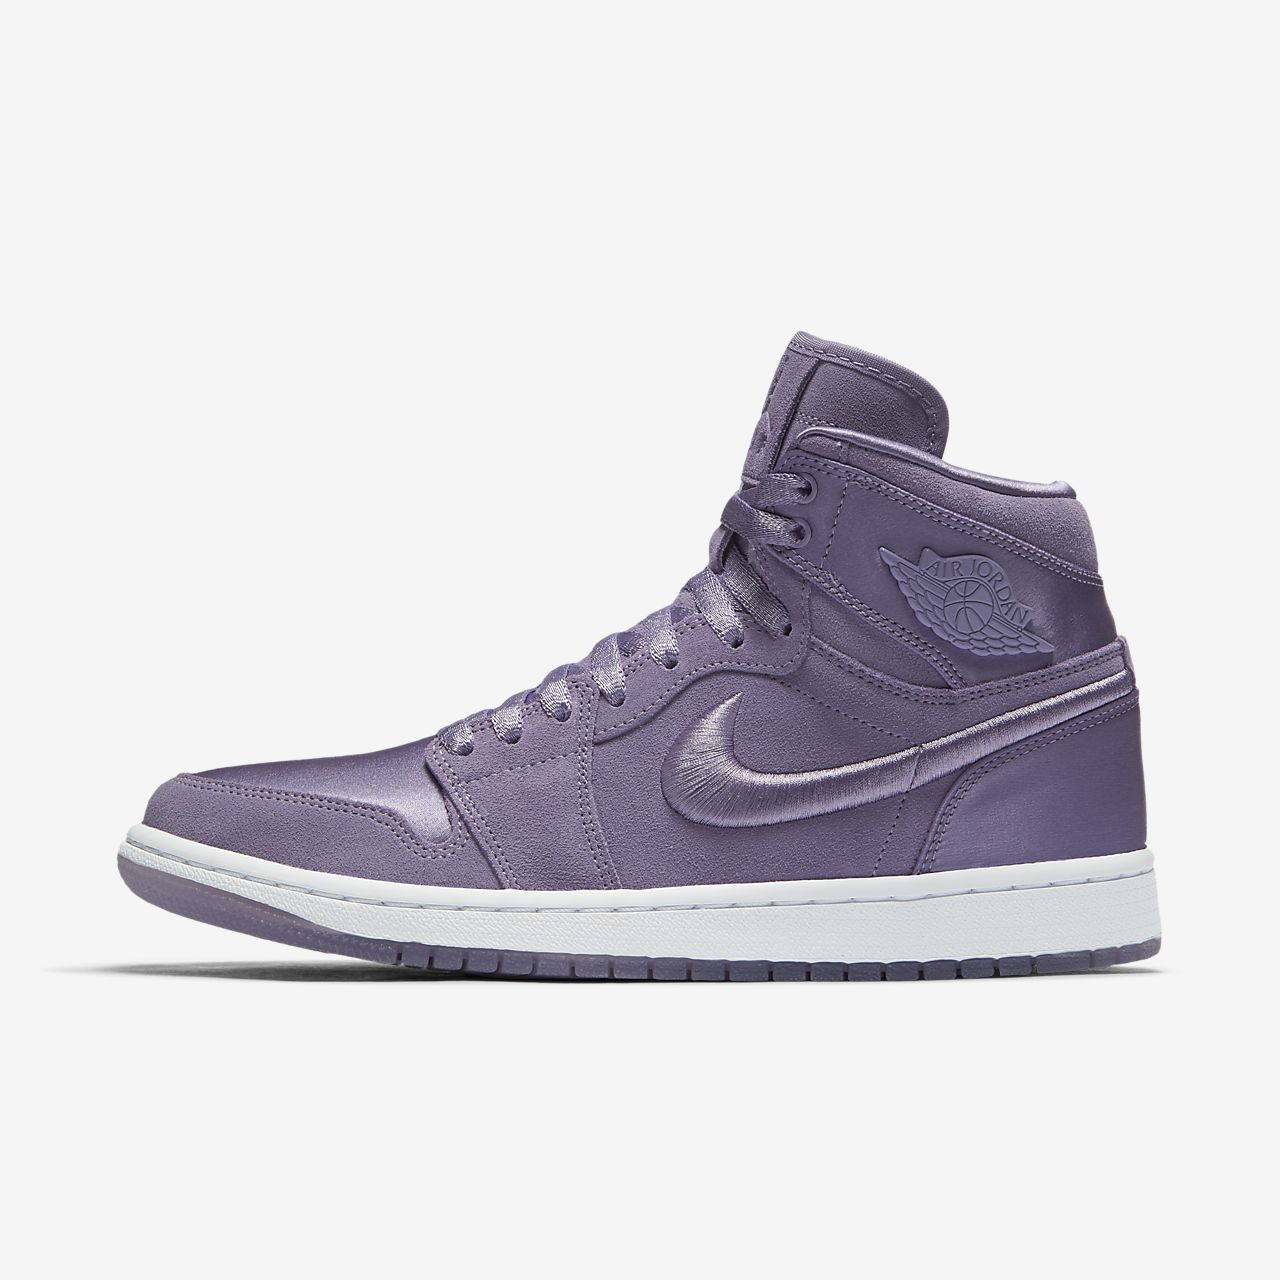 Air Jordan 1 Retro High Women's Shoe